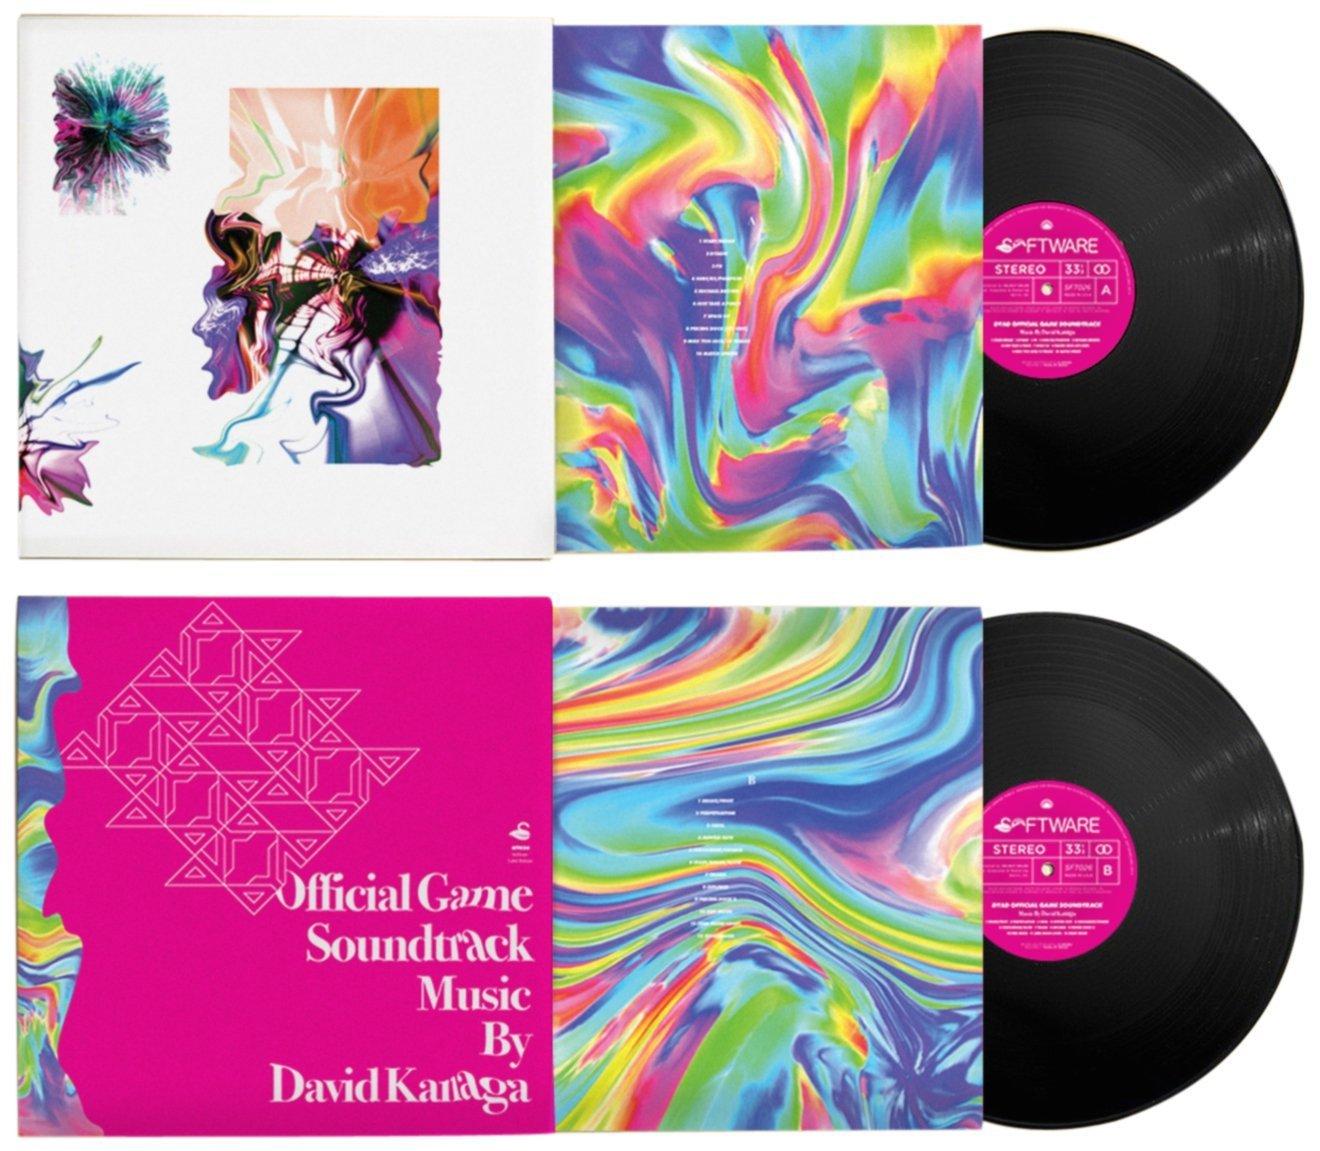 Vinilo : David Kanaga - Dyad Ogst (Downloadable Bonus Tracks)